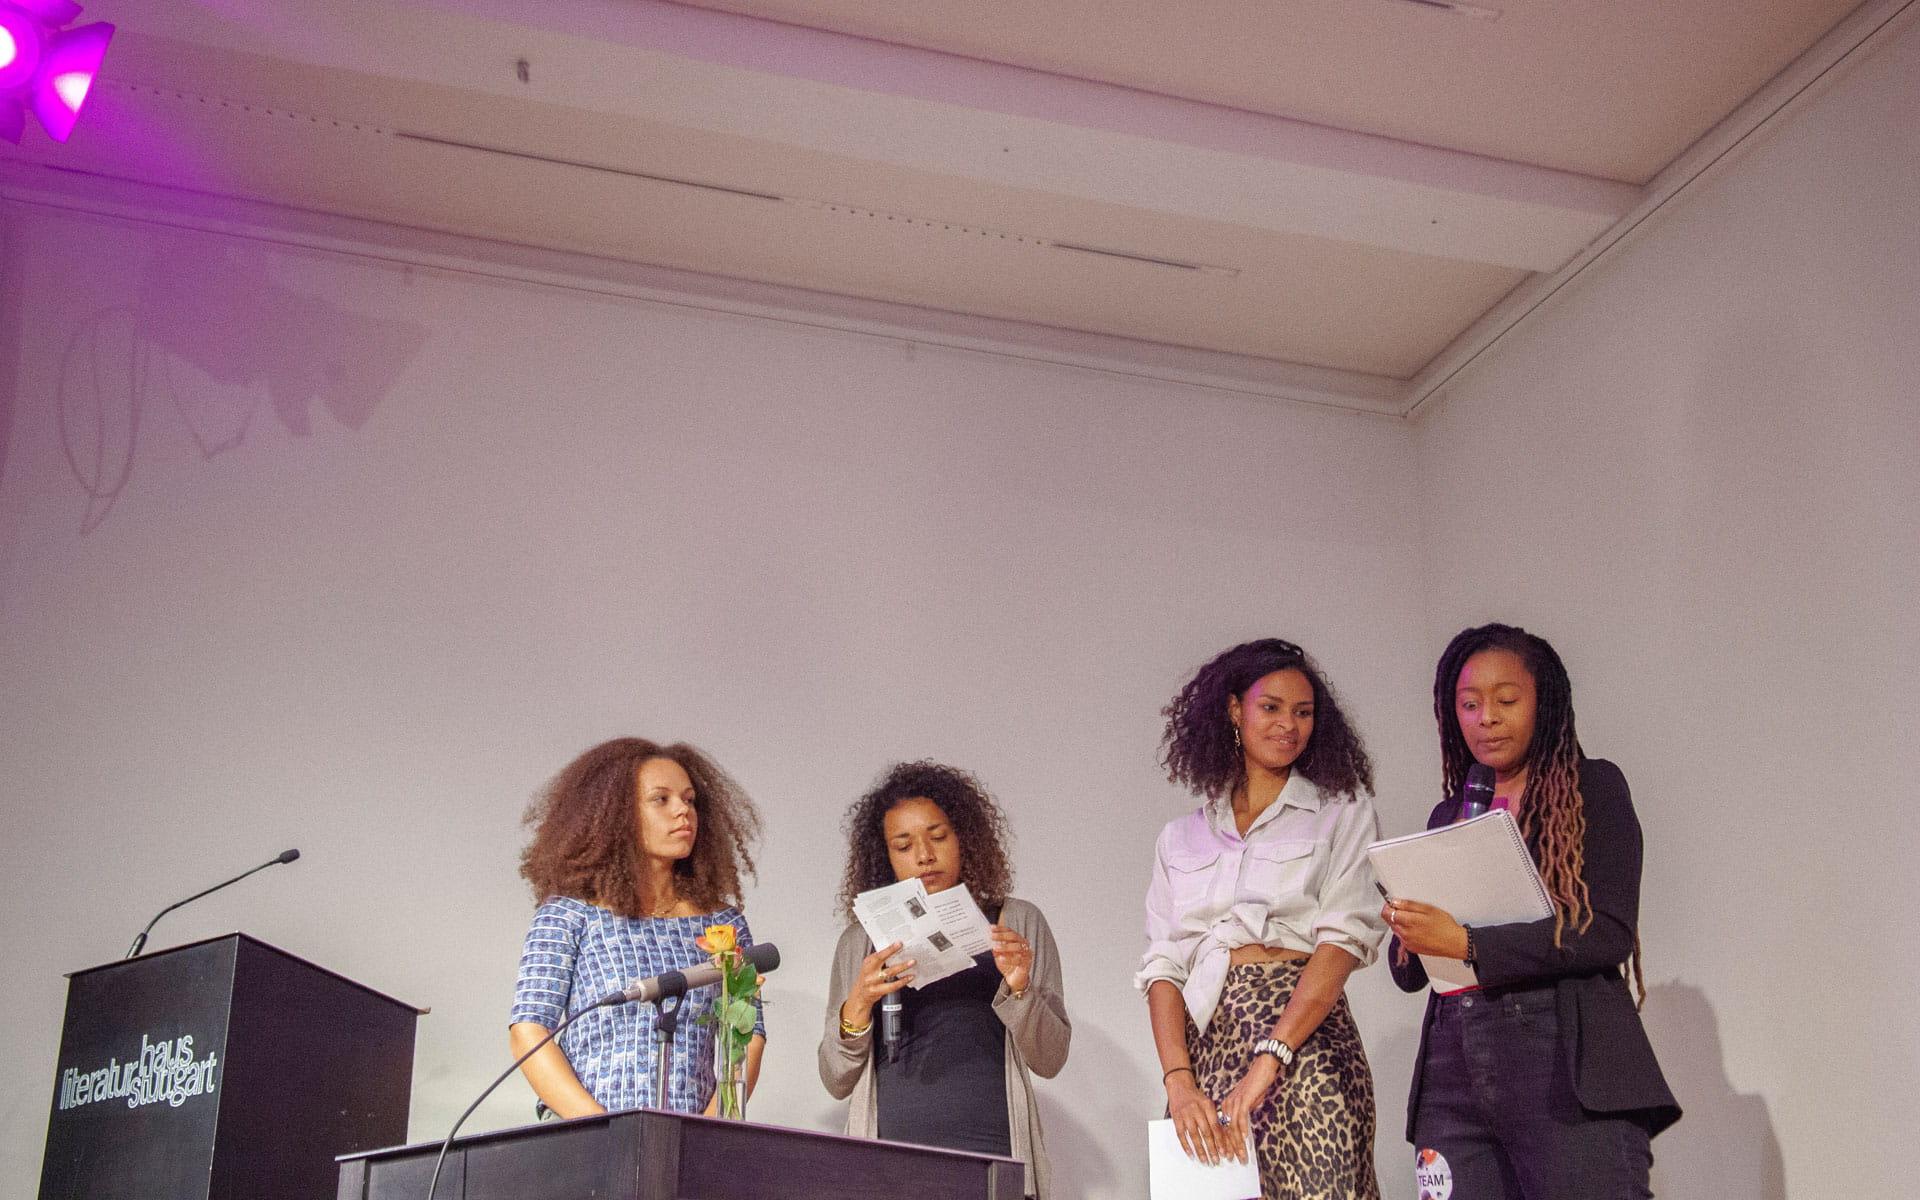 Aleya Kassam, Ketty Nivyabandi, Jean-Luc Raharimanana, Anja Saleh: Slam Revue and Open Mic <br/>(c) Lemia Bodden